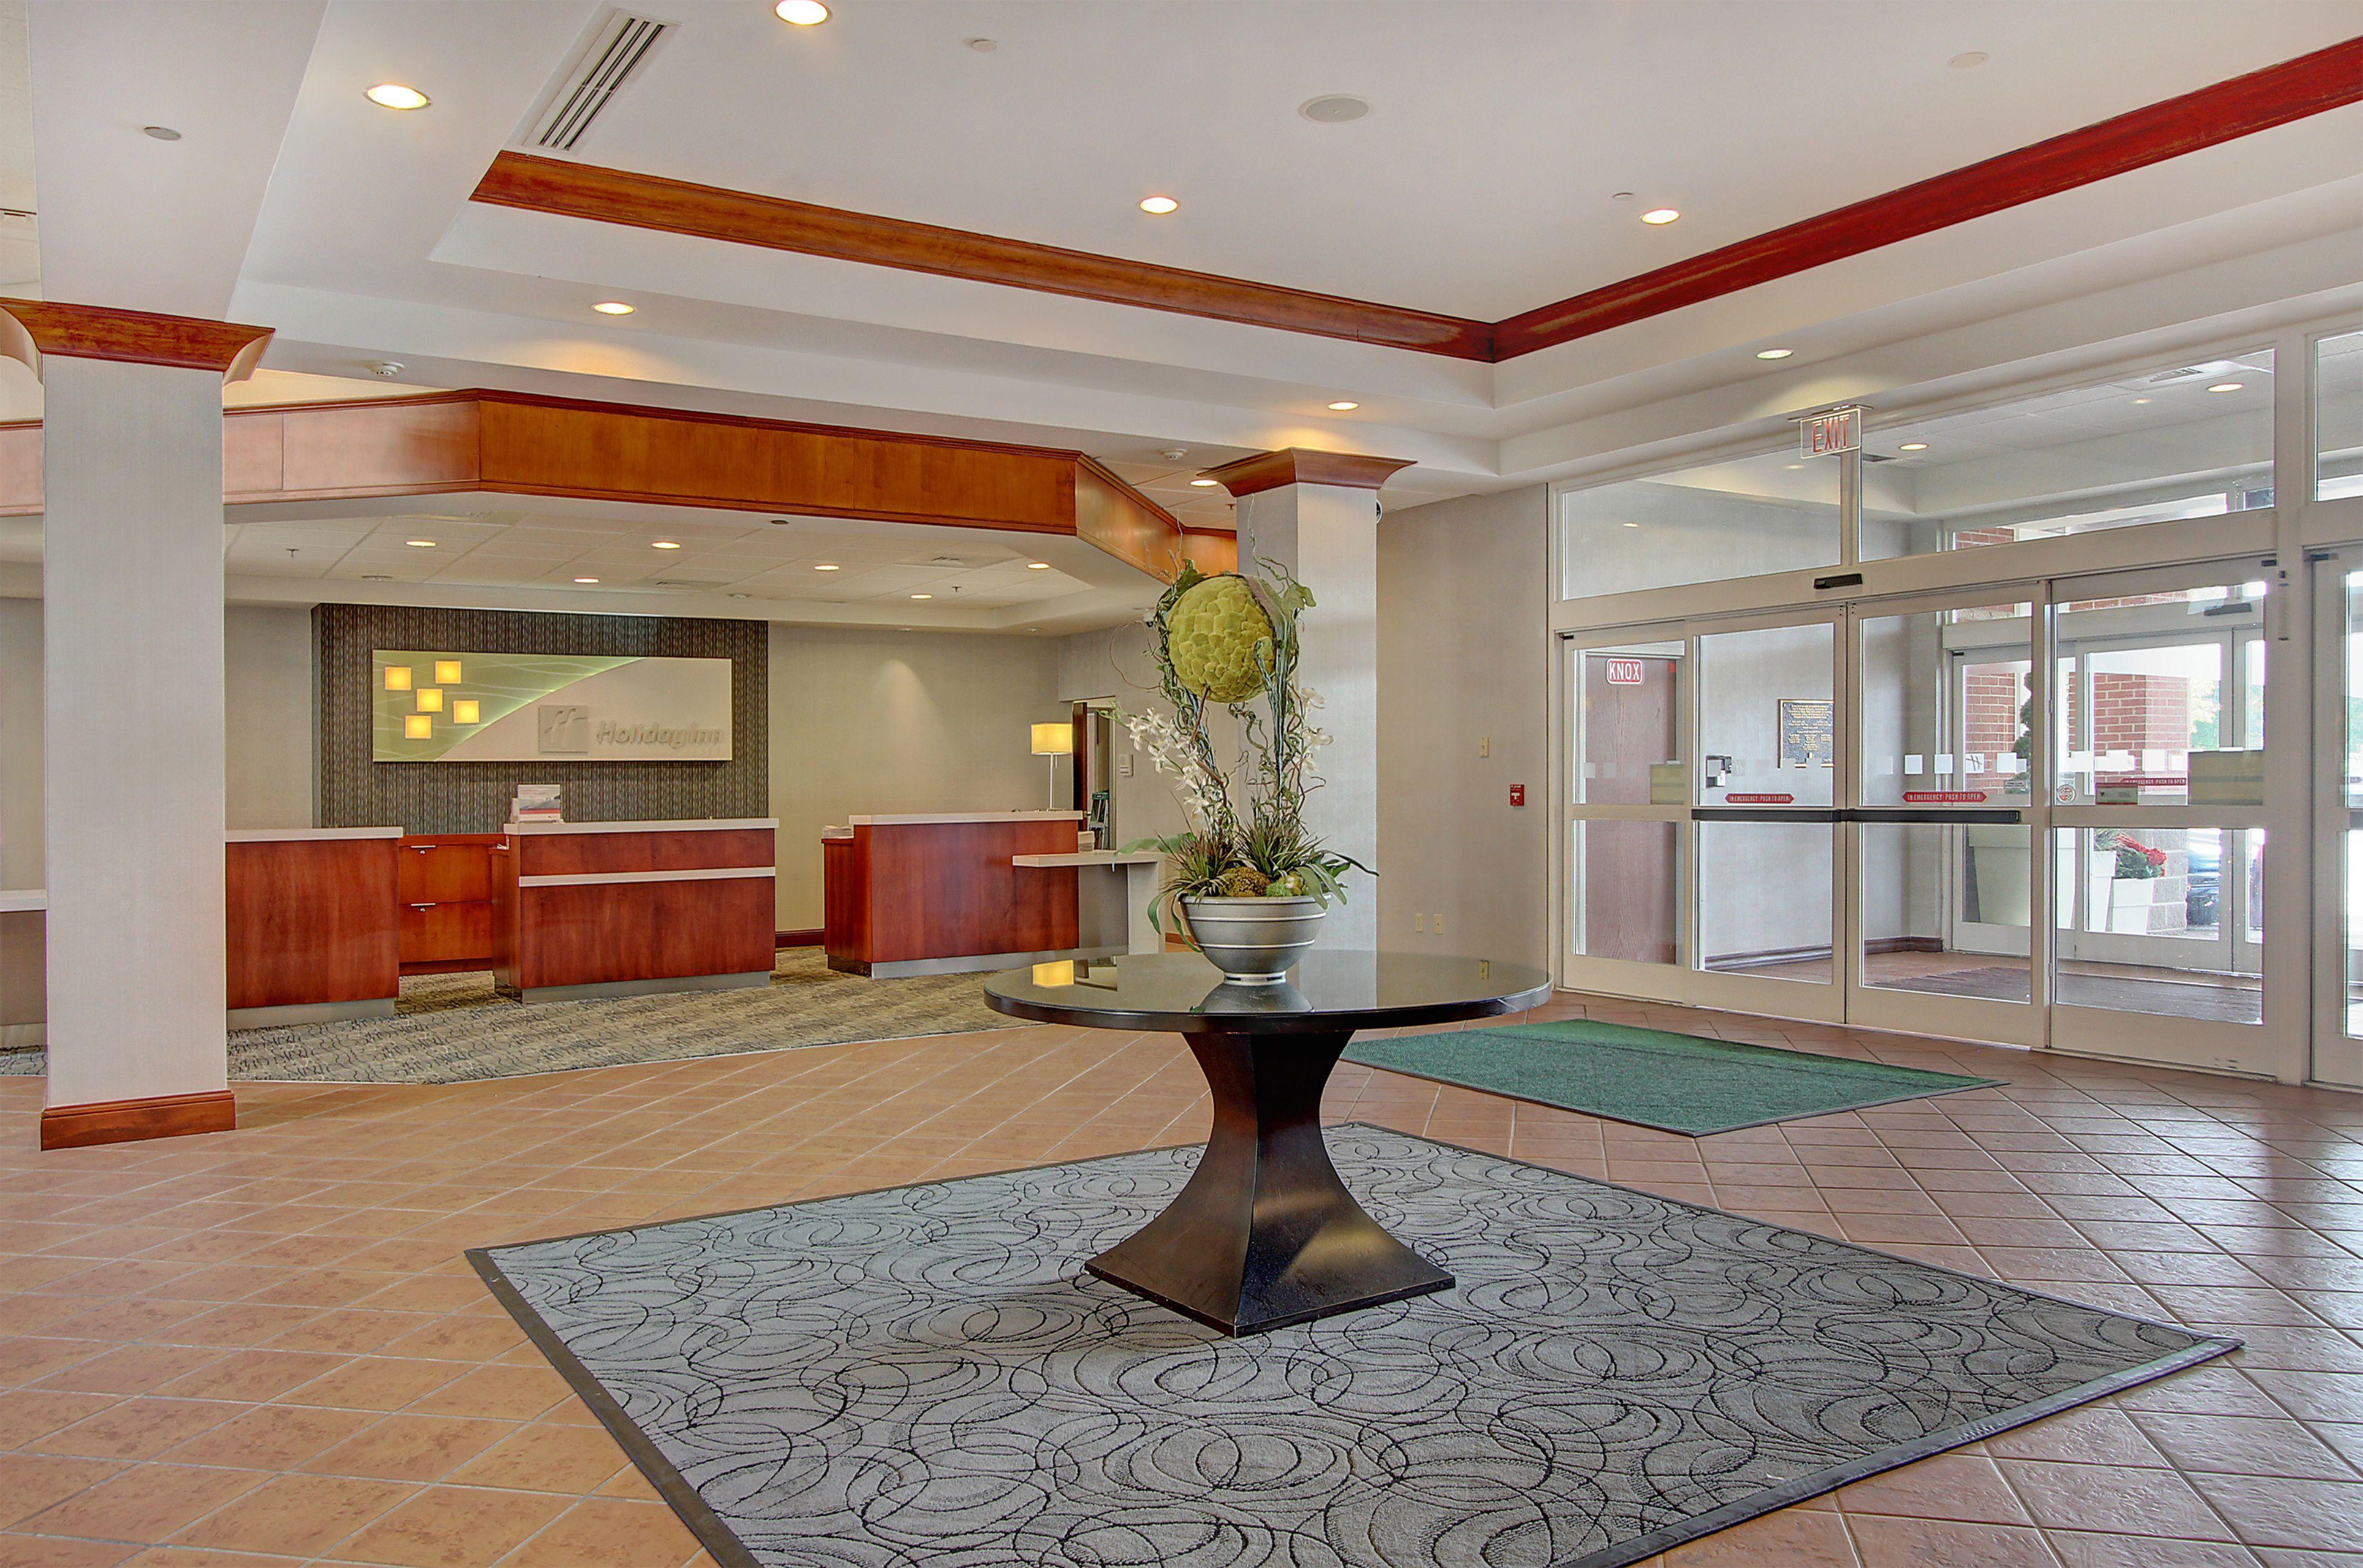 Holiday Inn University Plaza-Bowling Green image 5